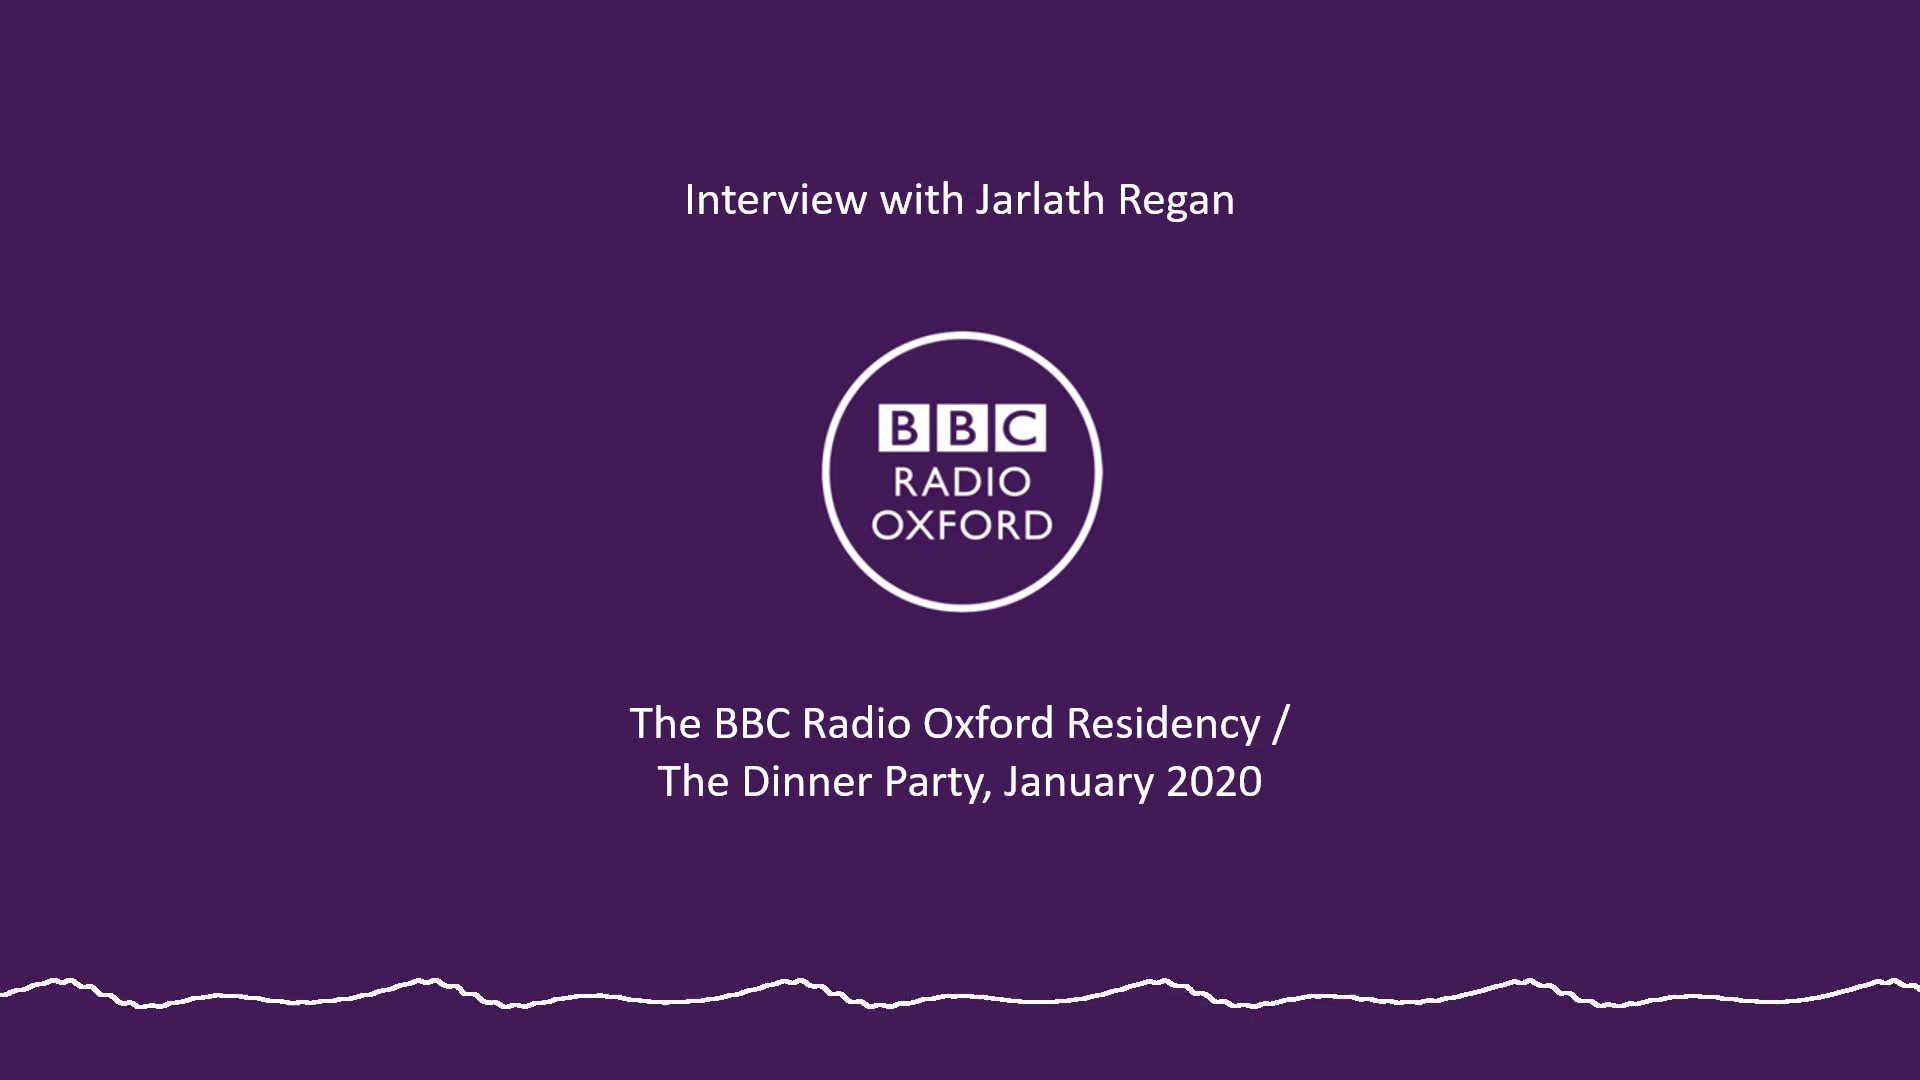 Interview with Jarlath Regan